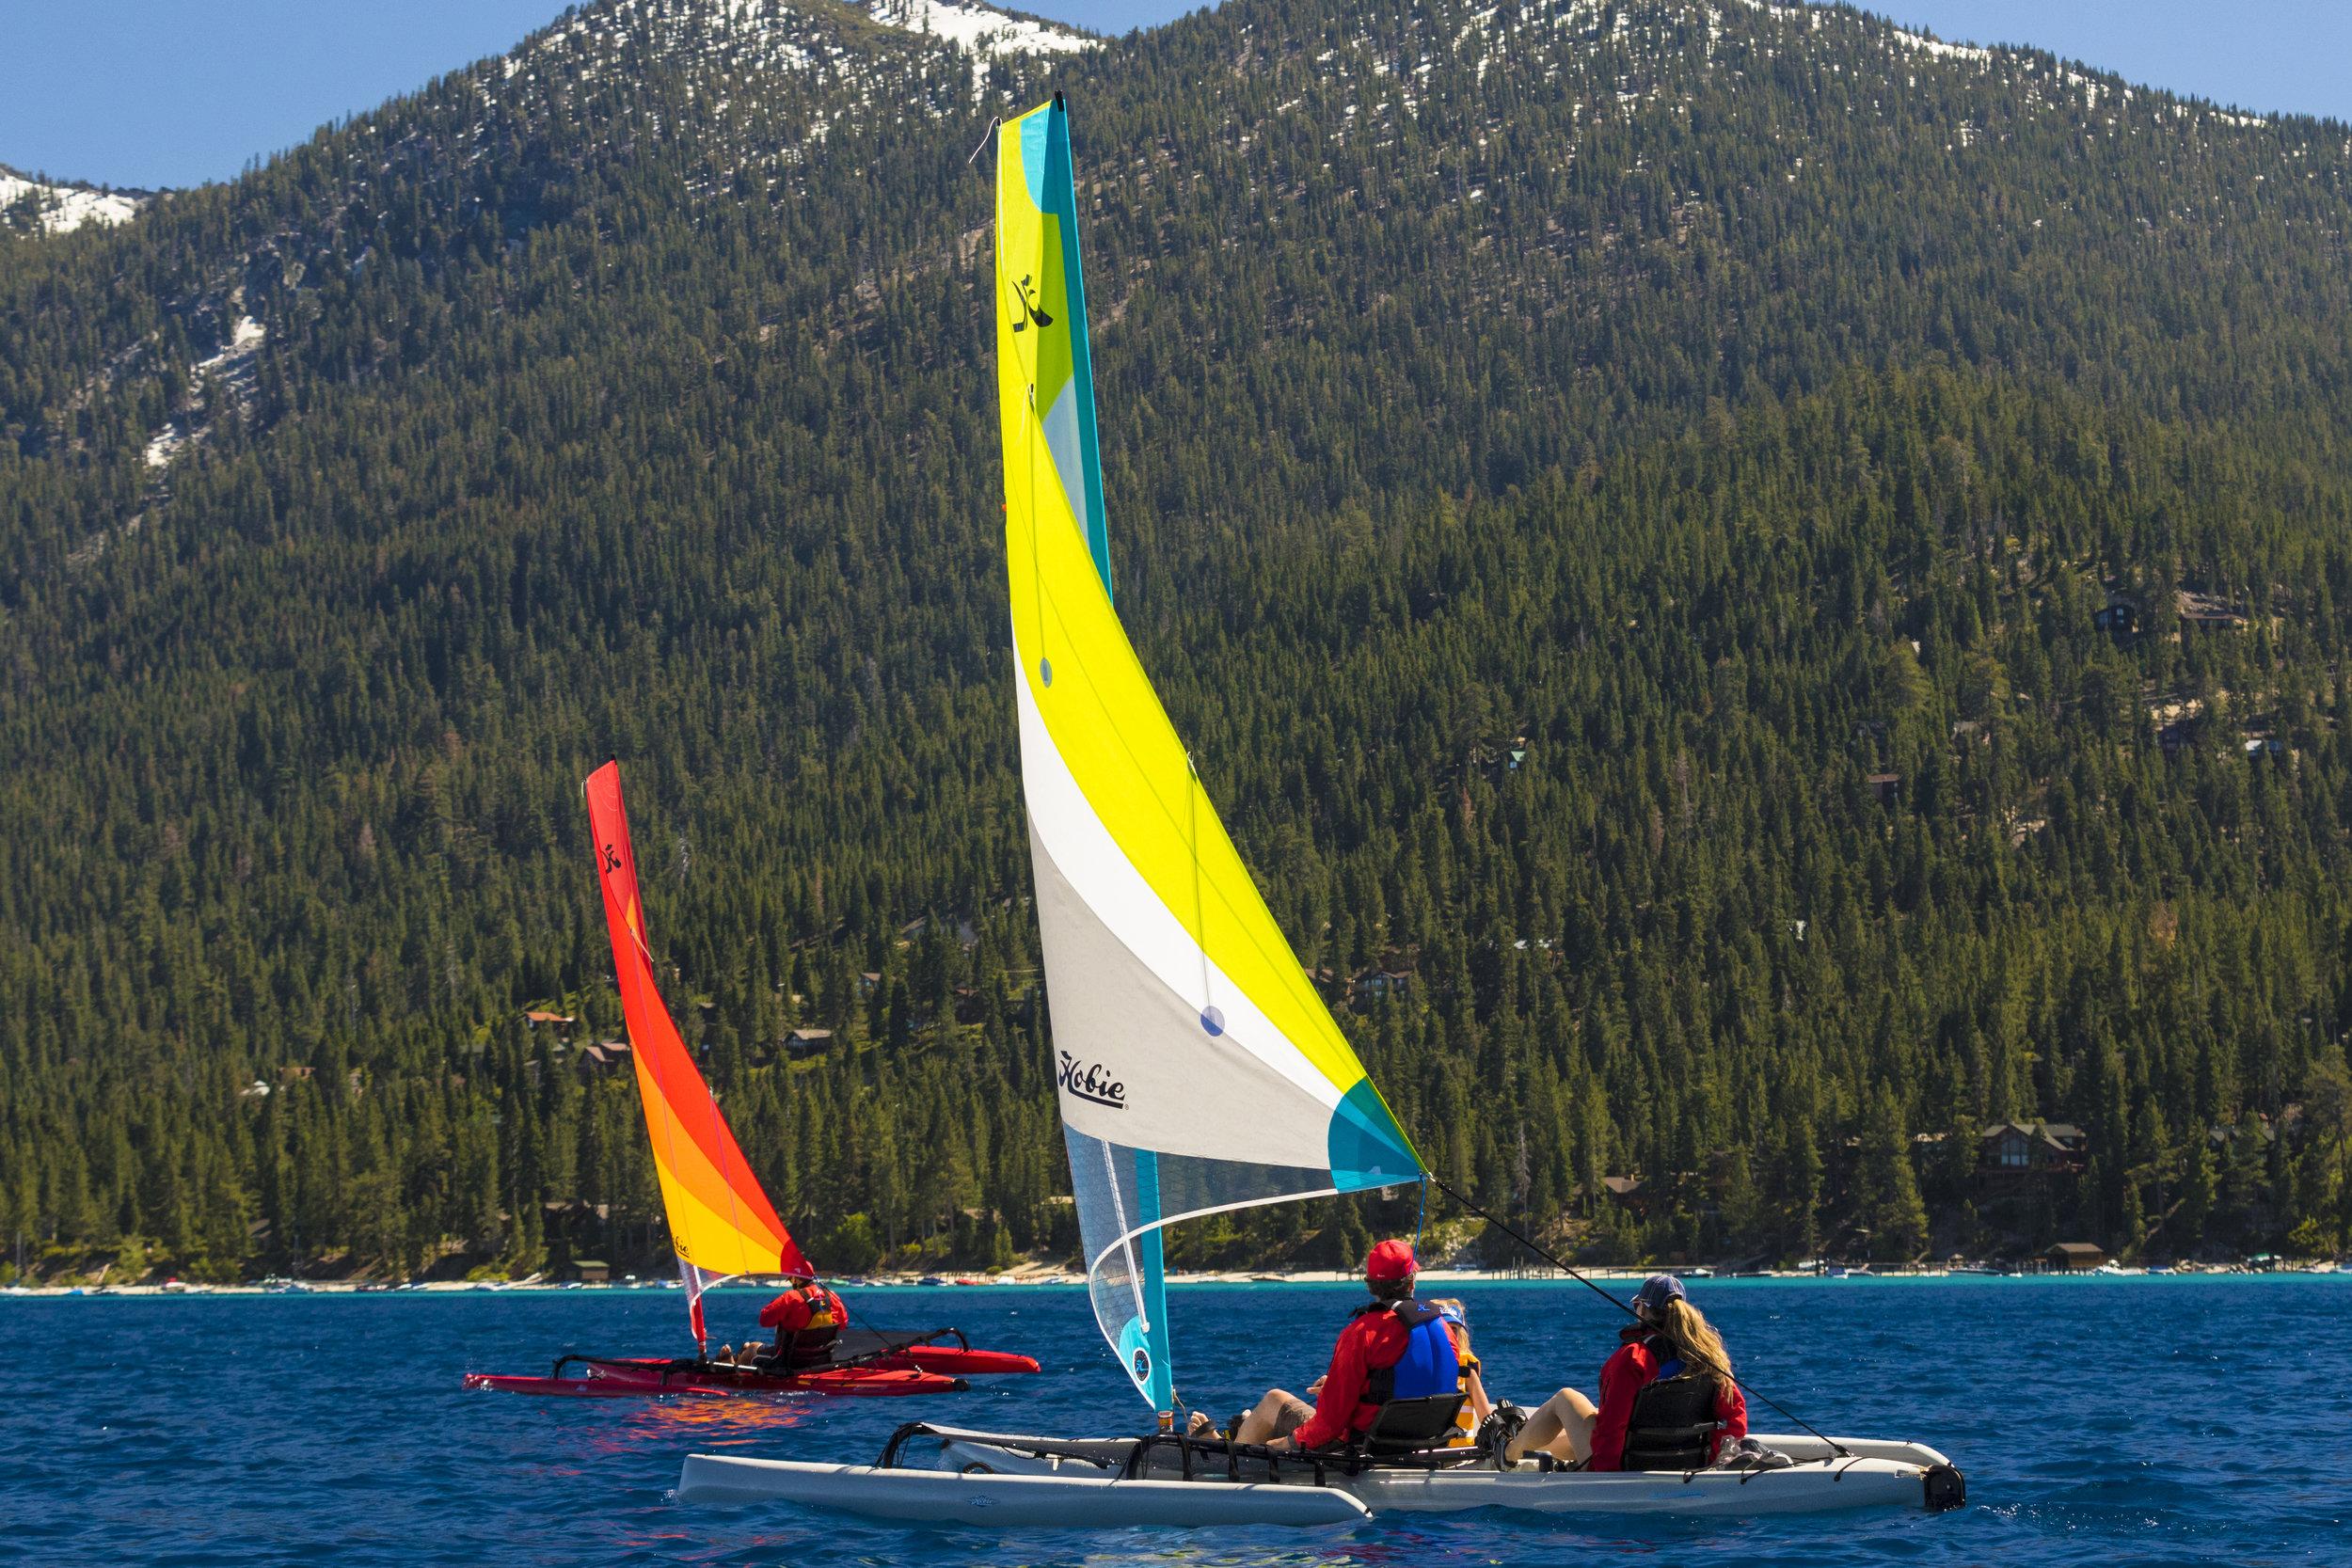 Islands_action_Tahoe_red_dune_snowyForest_2453_full.jpg